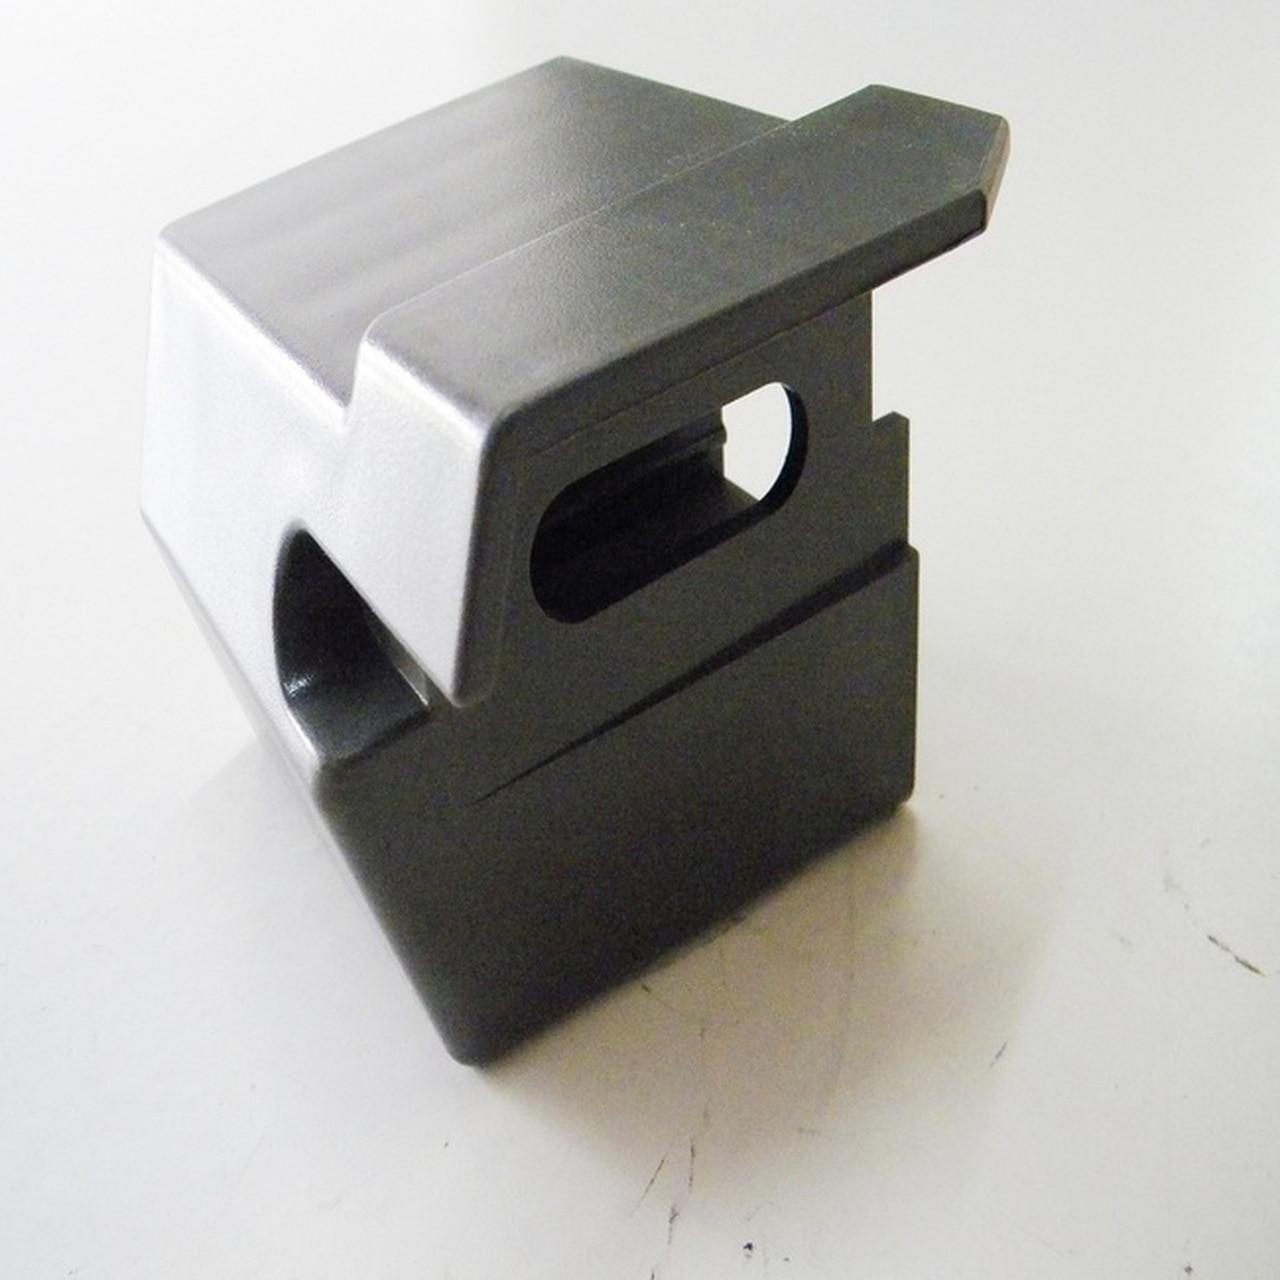 Sears Weslo Treadmill Model 295330 CROSSWALK 365e Left End Cap Part Number 186905